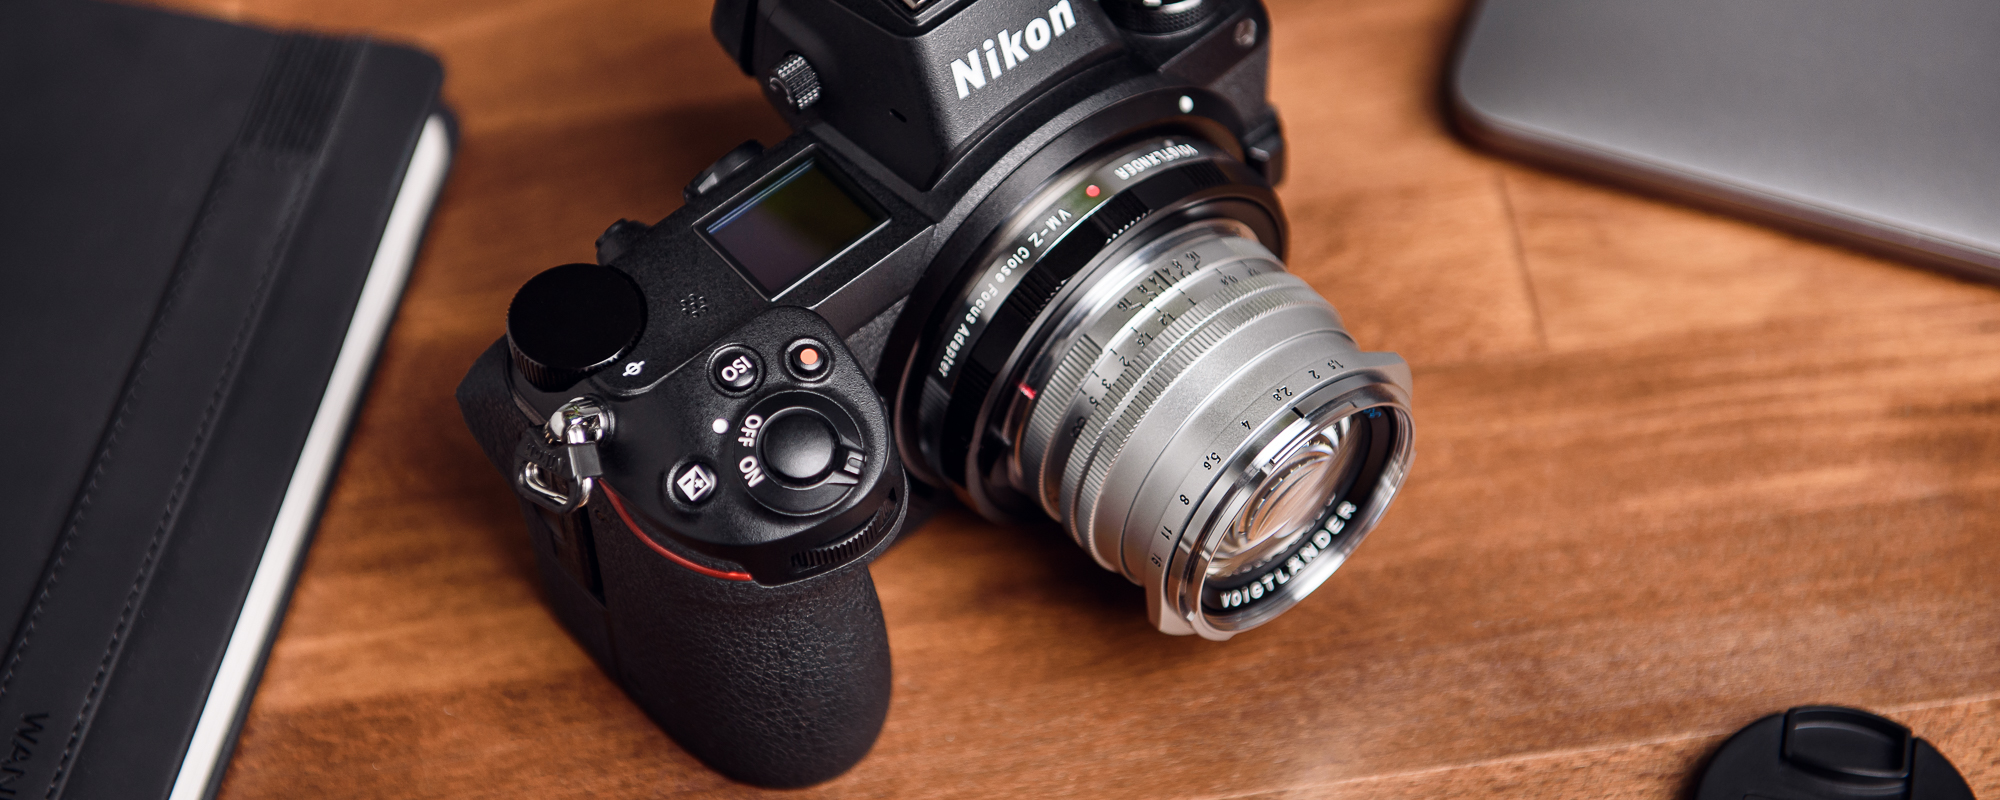 Voigtlander Nokton II 50 mm f/1.5 lens for Leica M - MC, silver on camera